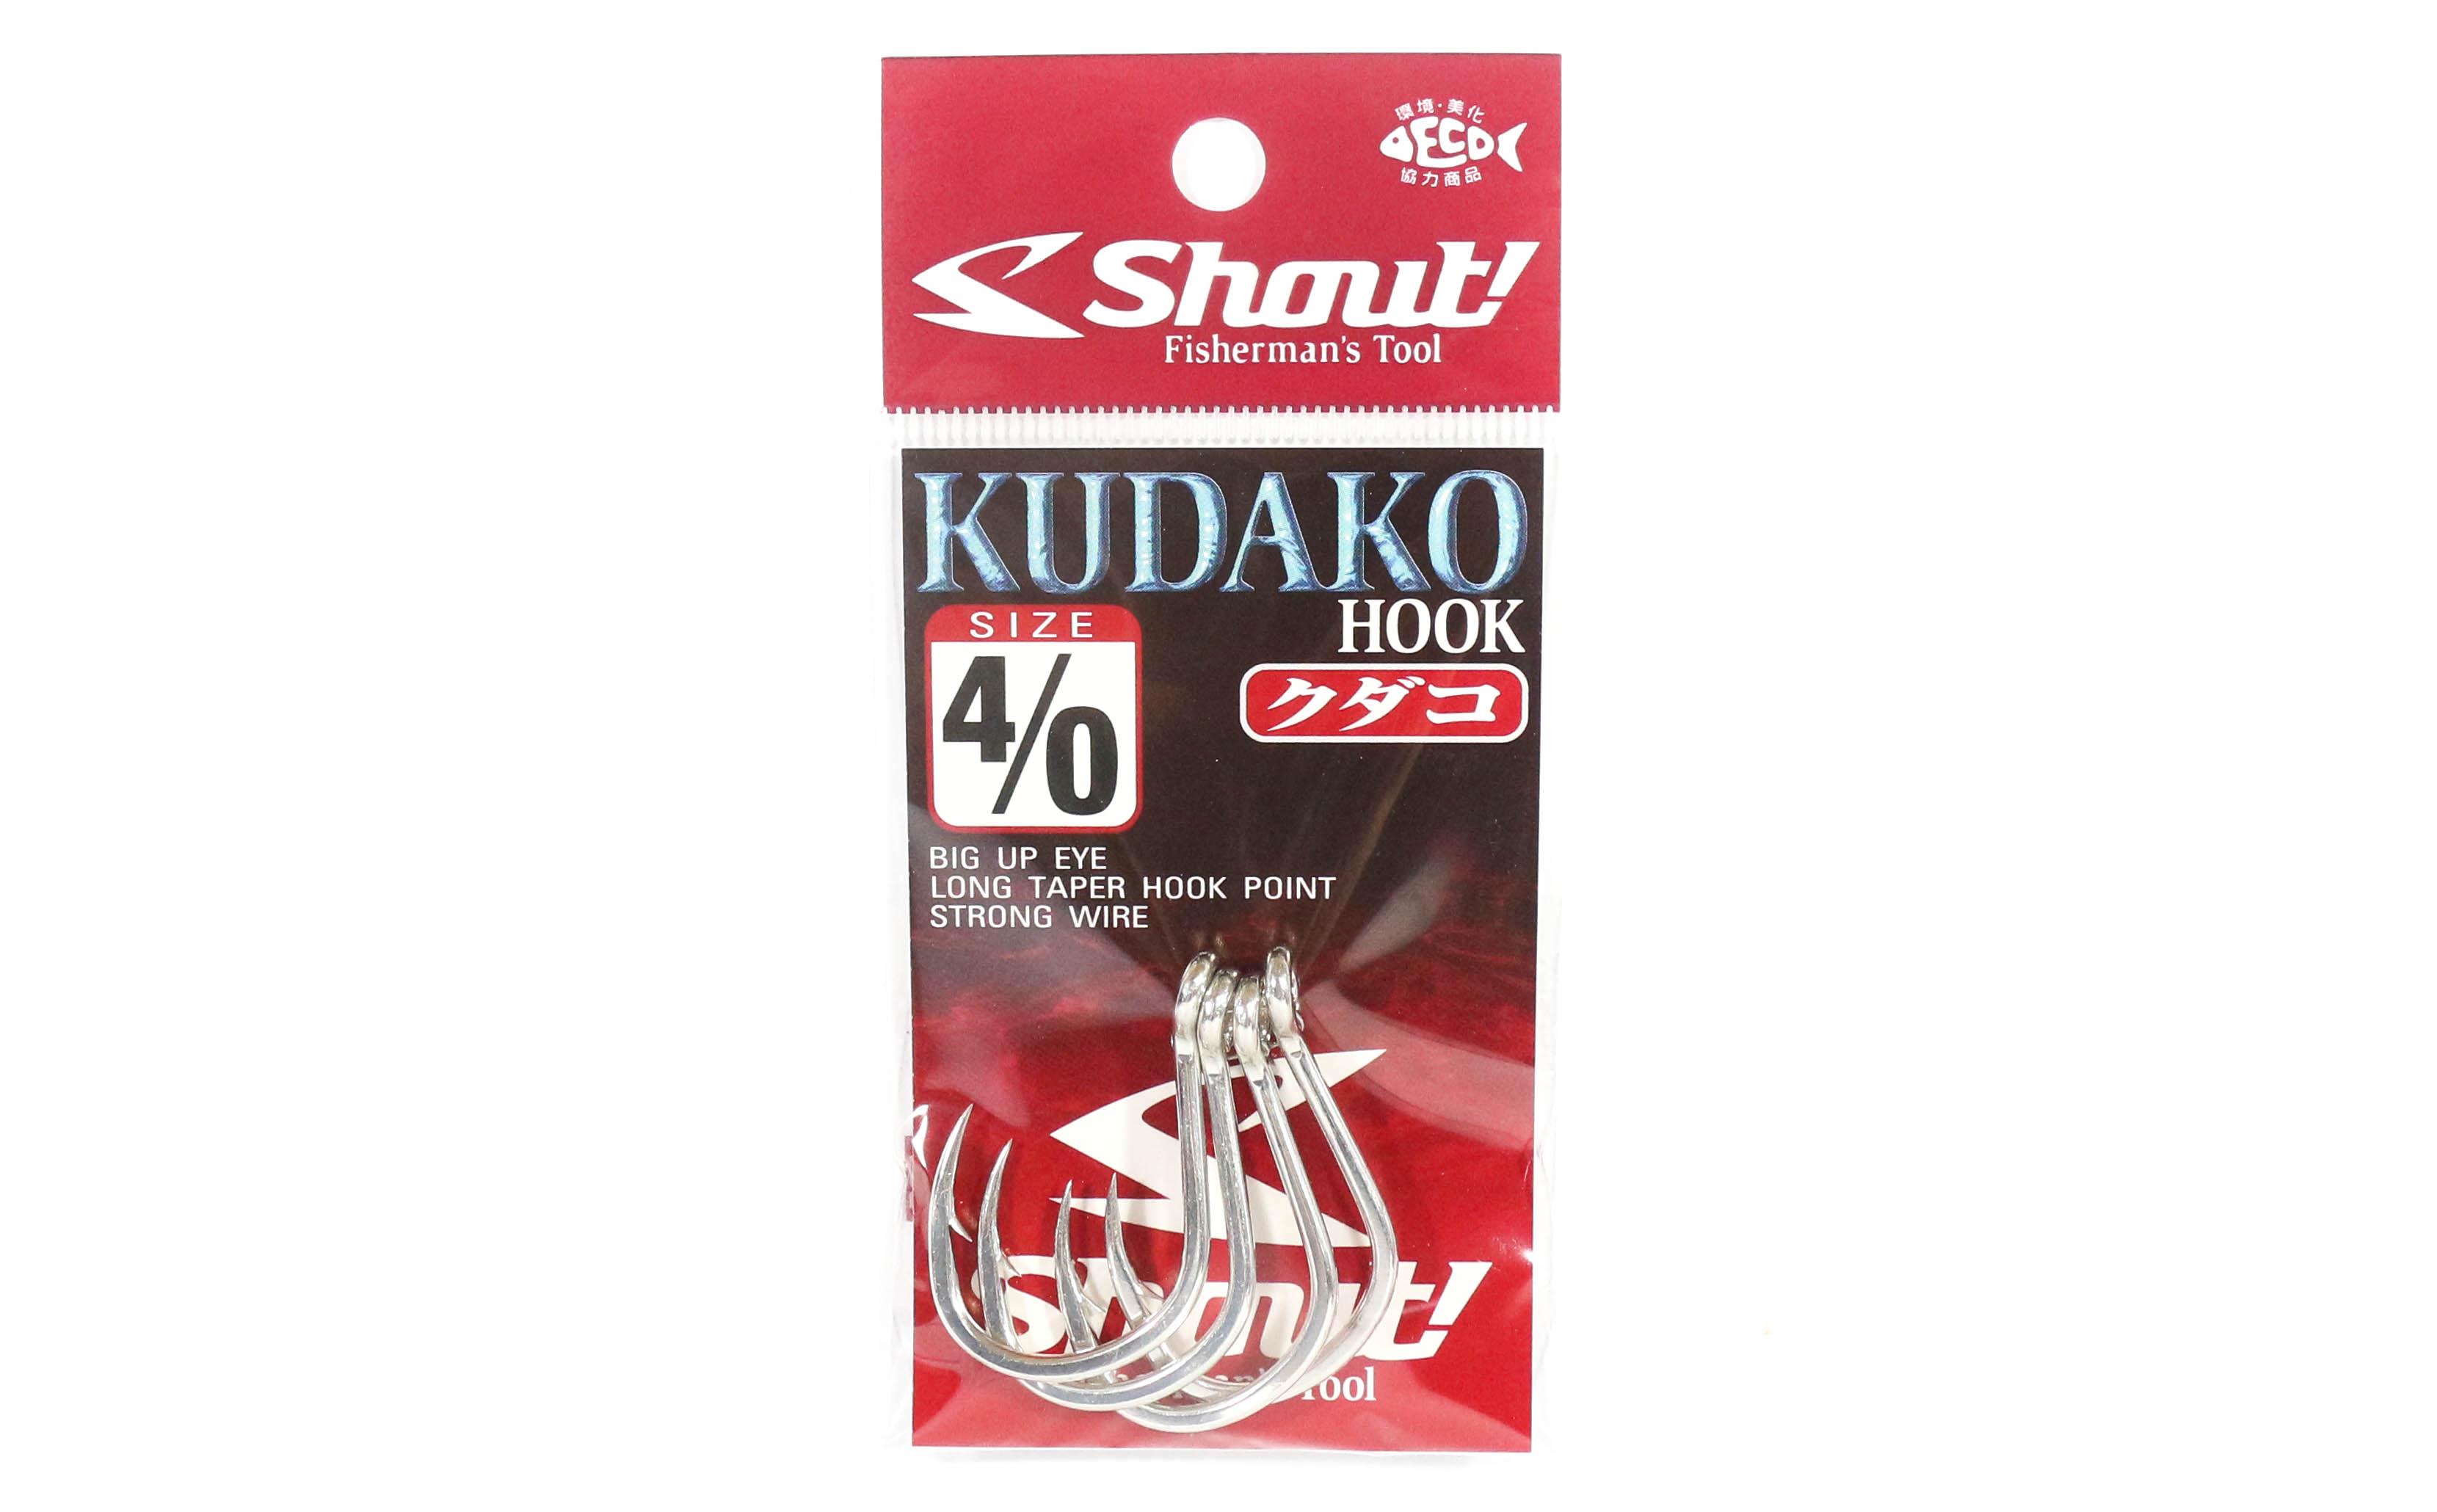 Shout 04-KH Kudako Power Jigging Single Hook Silver Size 4/0 (7406)